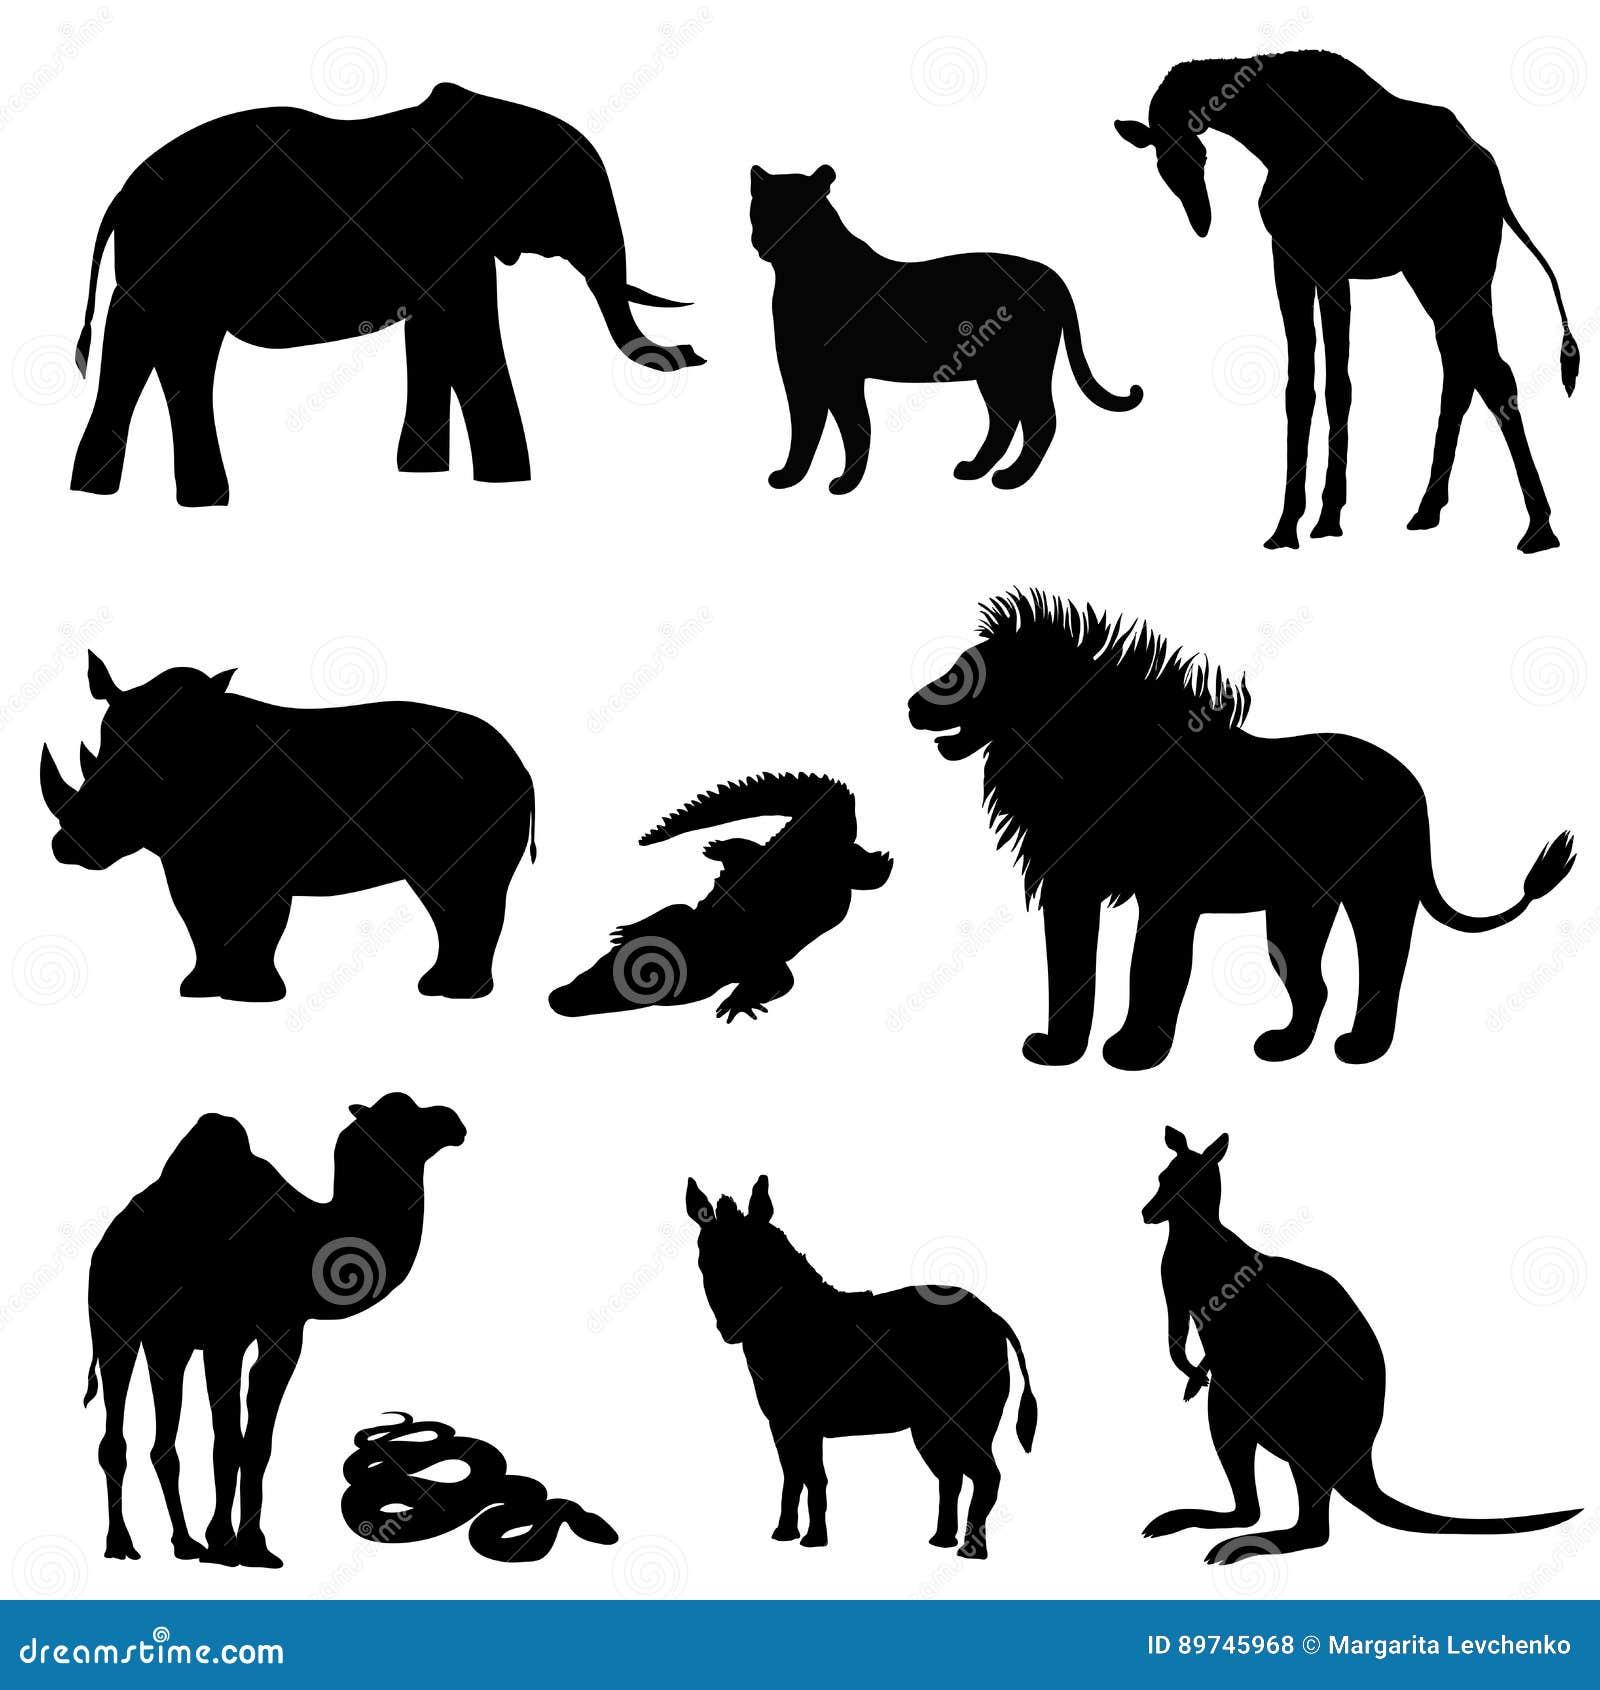 Vektorillustration, bilden av djur, djur svart silhouette Elefant känguru, kamel, lejon, sebra, noshörning, giraff,